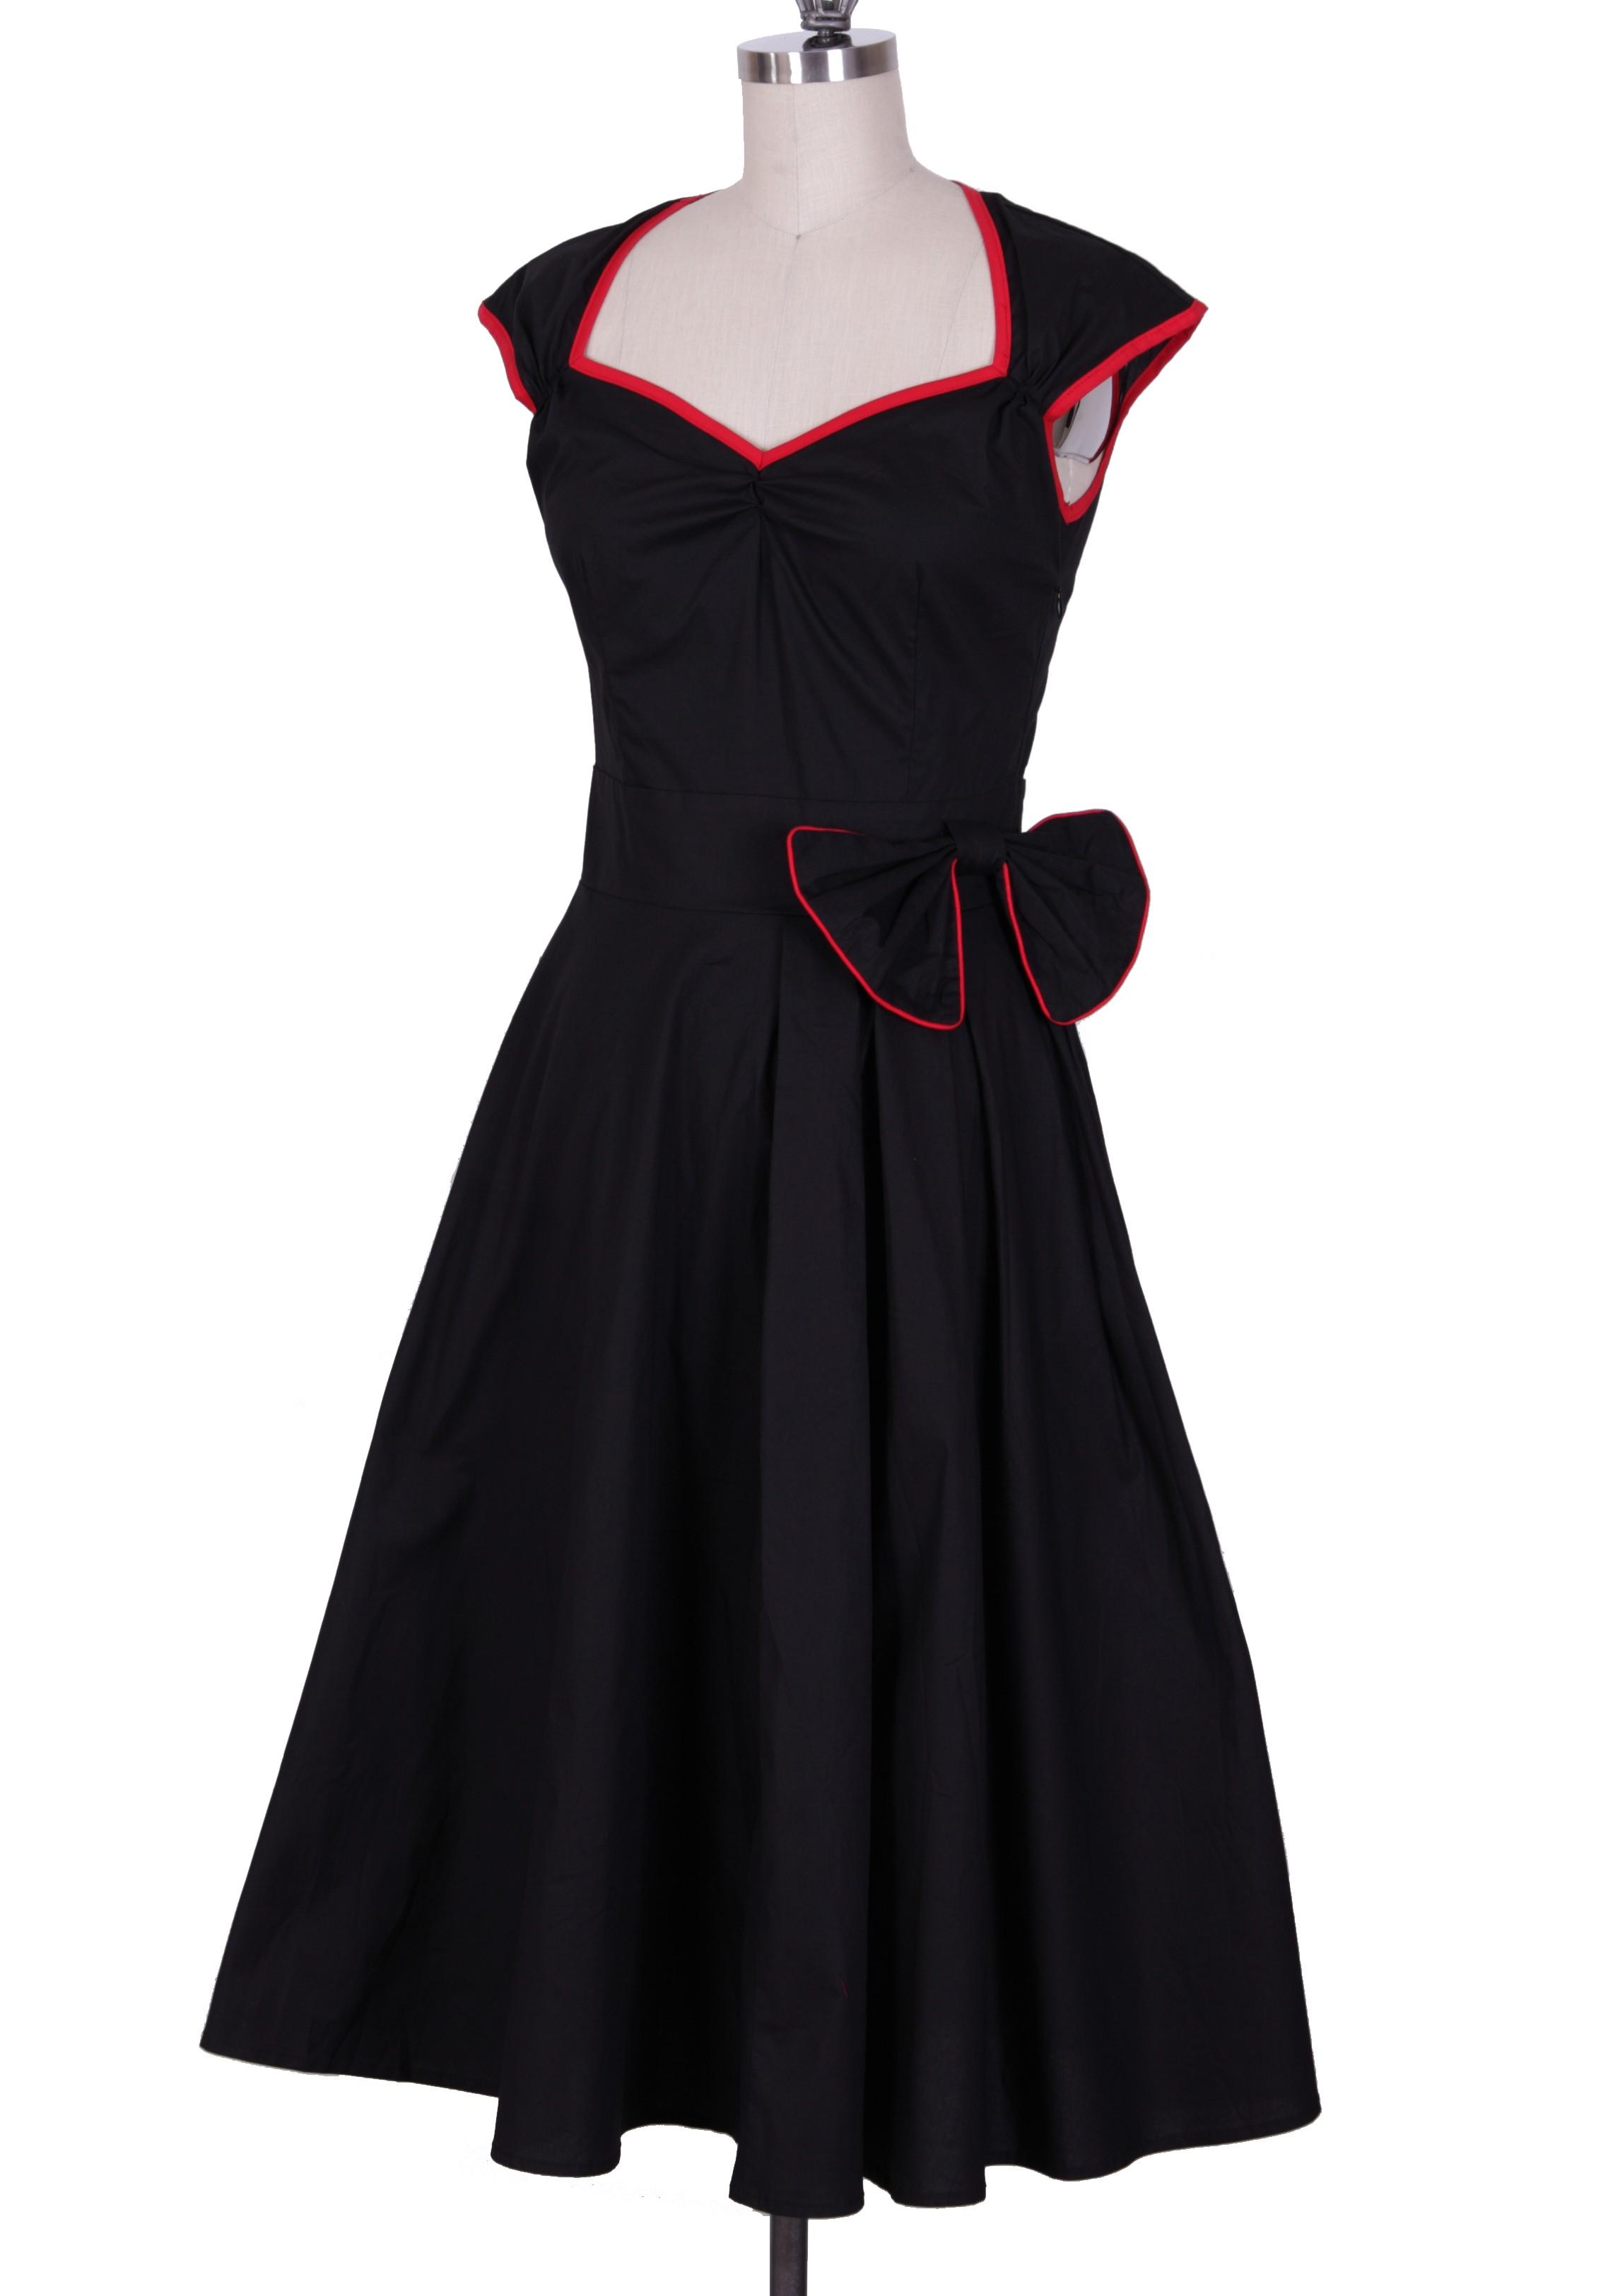 Take A Bow Rockabilly Party Housewife 50s Dress | ReoRia